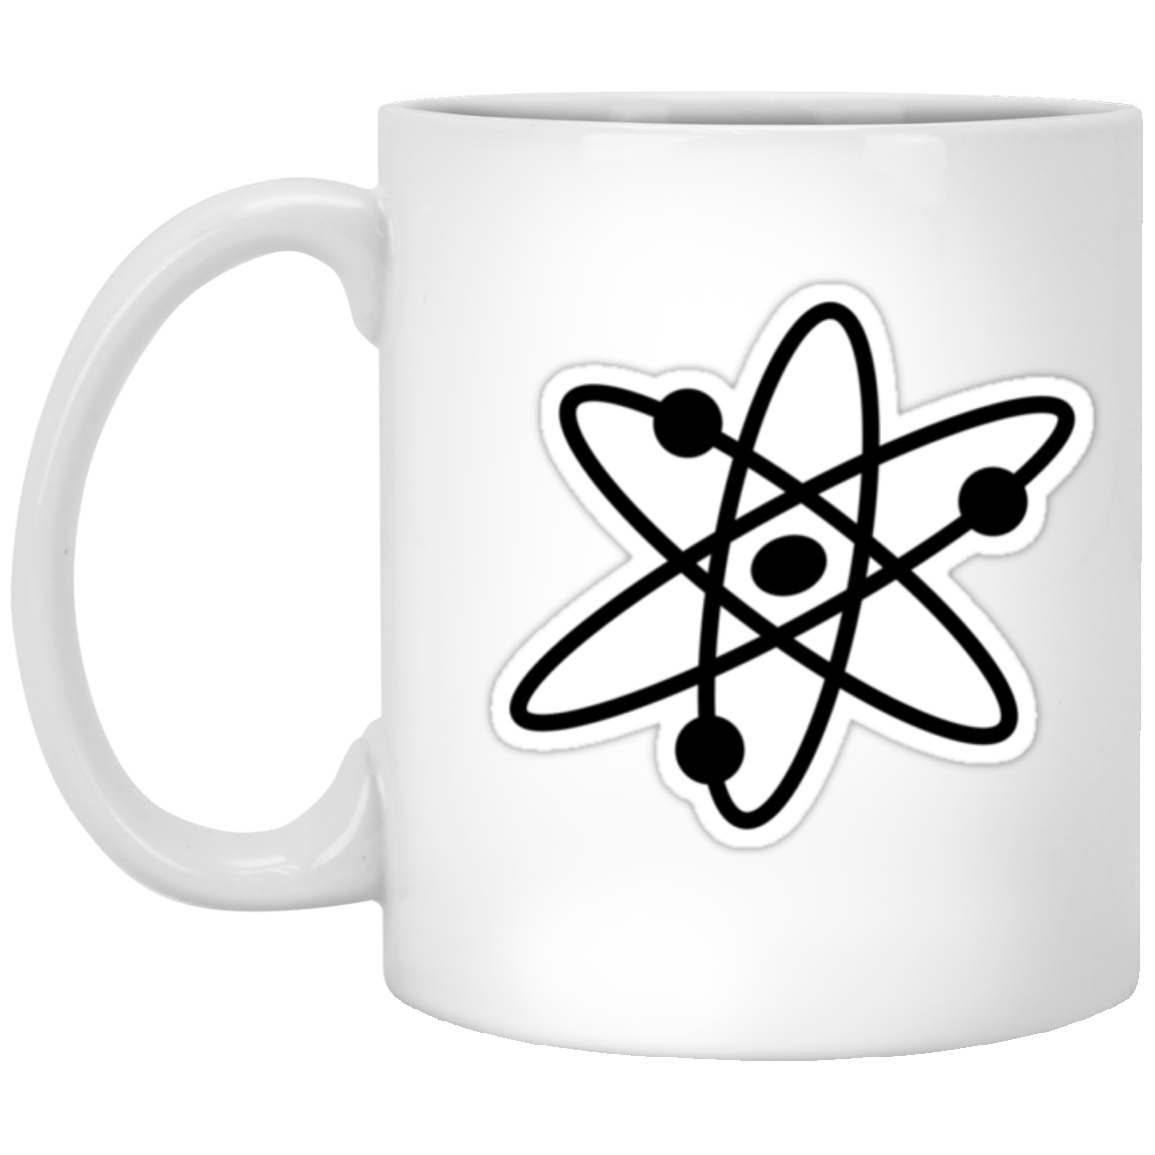 Big Bang Theory Xp8434 11 Oz White Mug